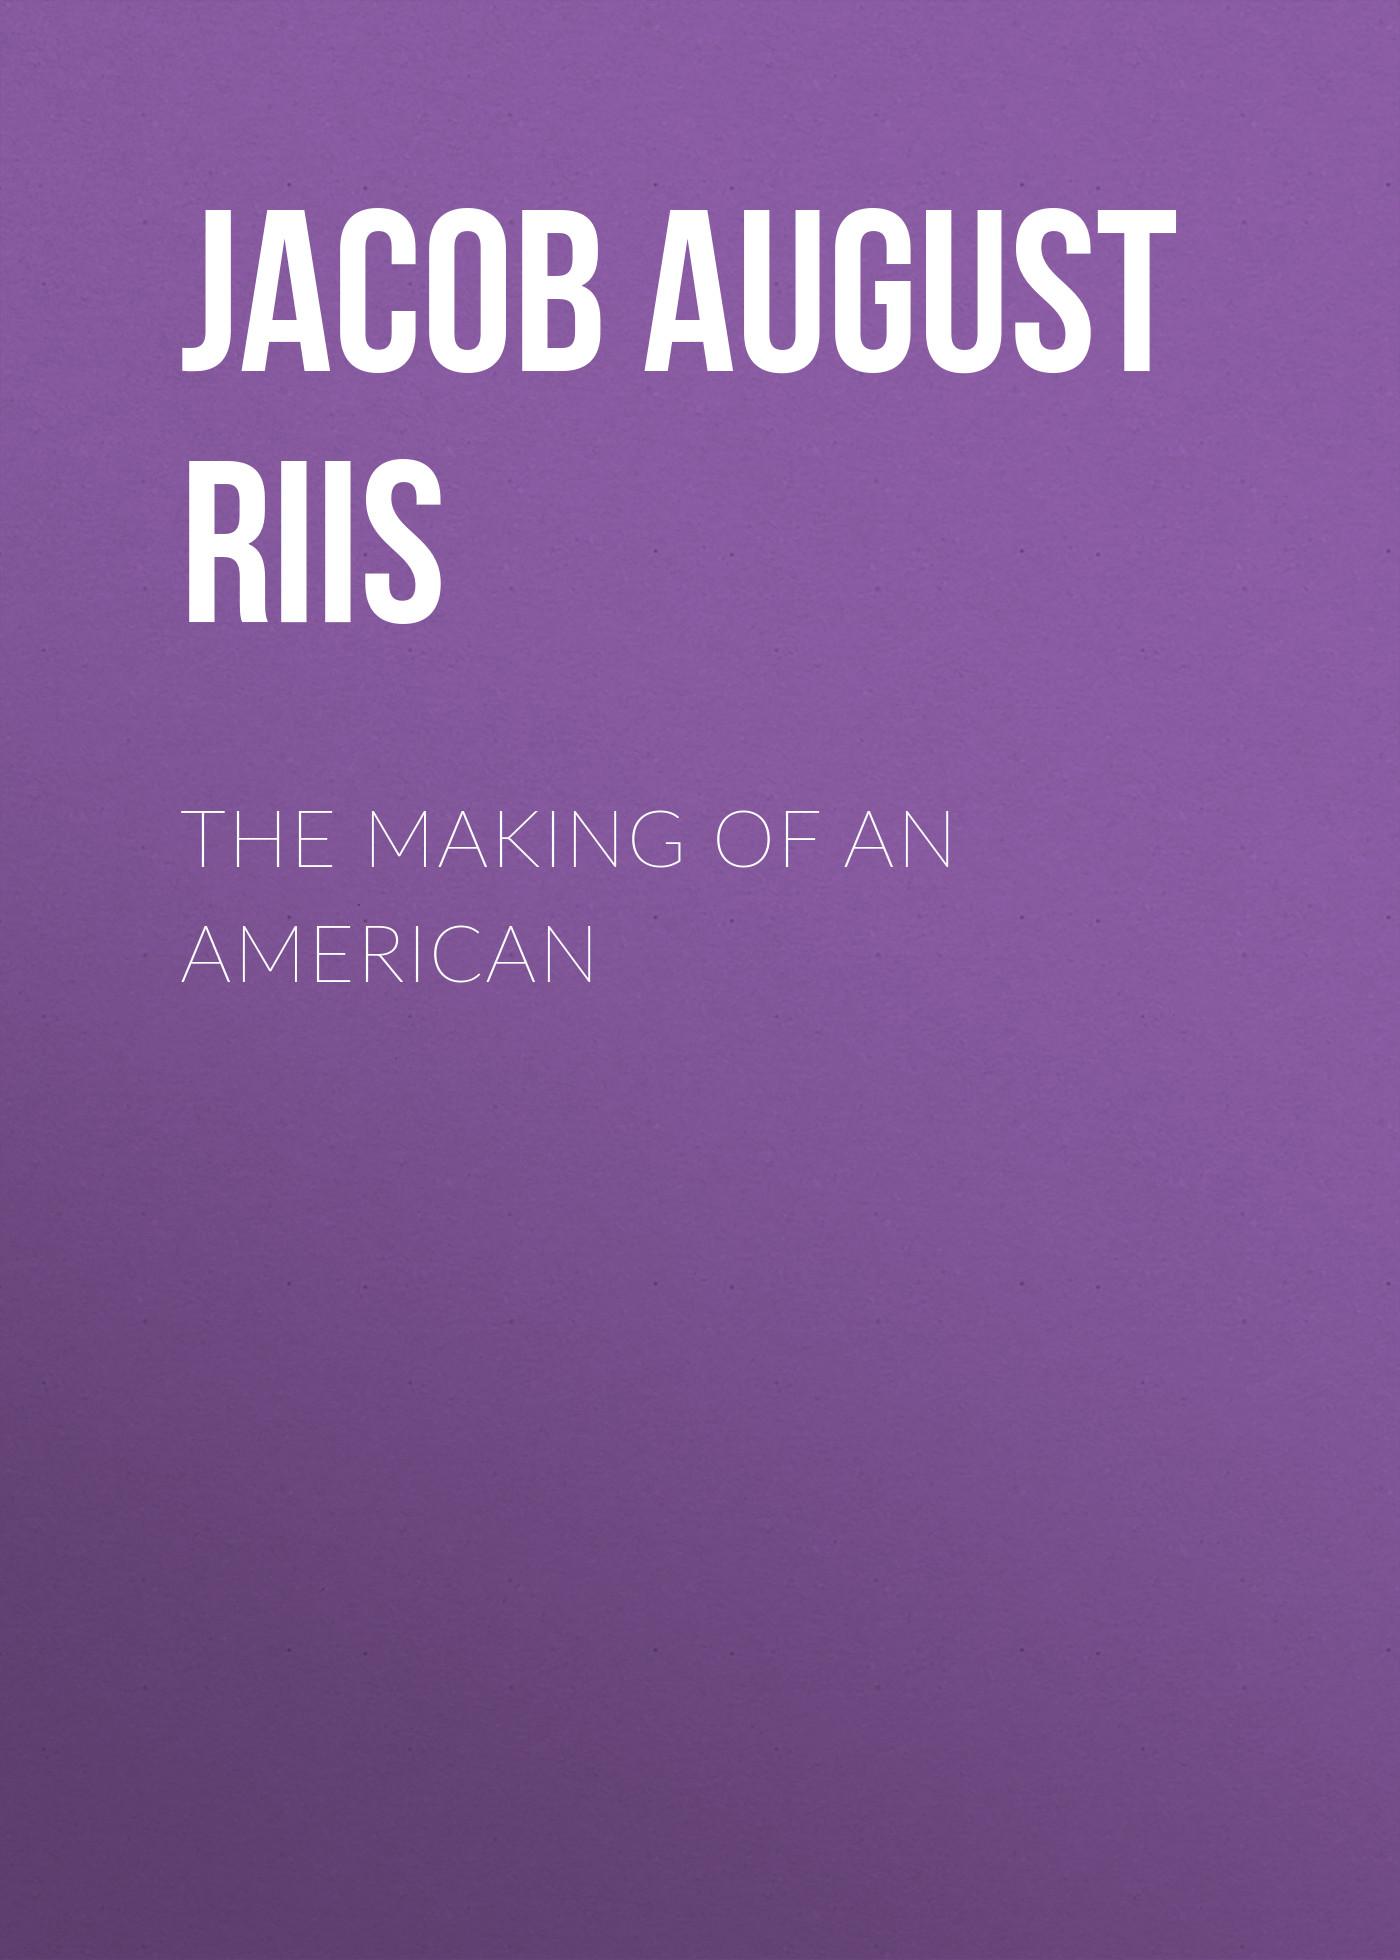 Jacob August Riis The Making of an American jacob august riis nibsy s christmas